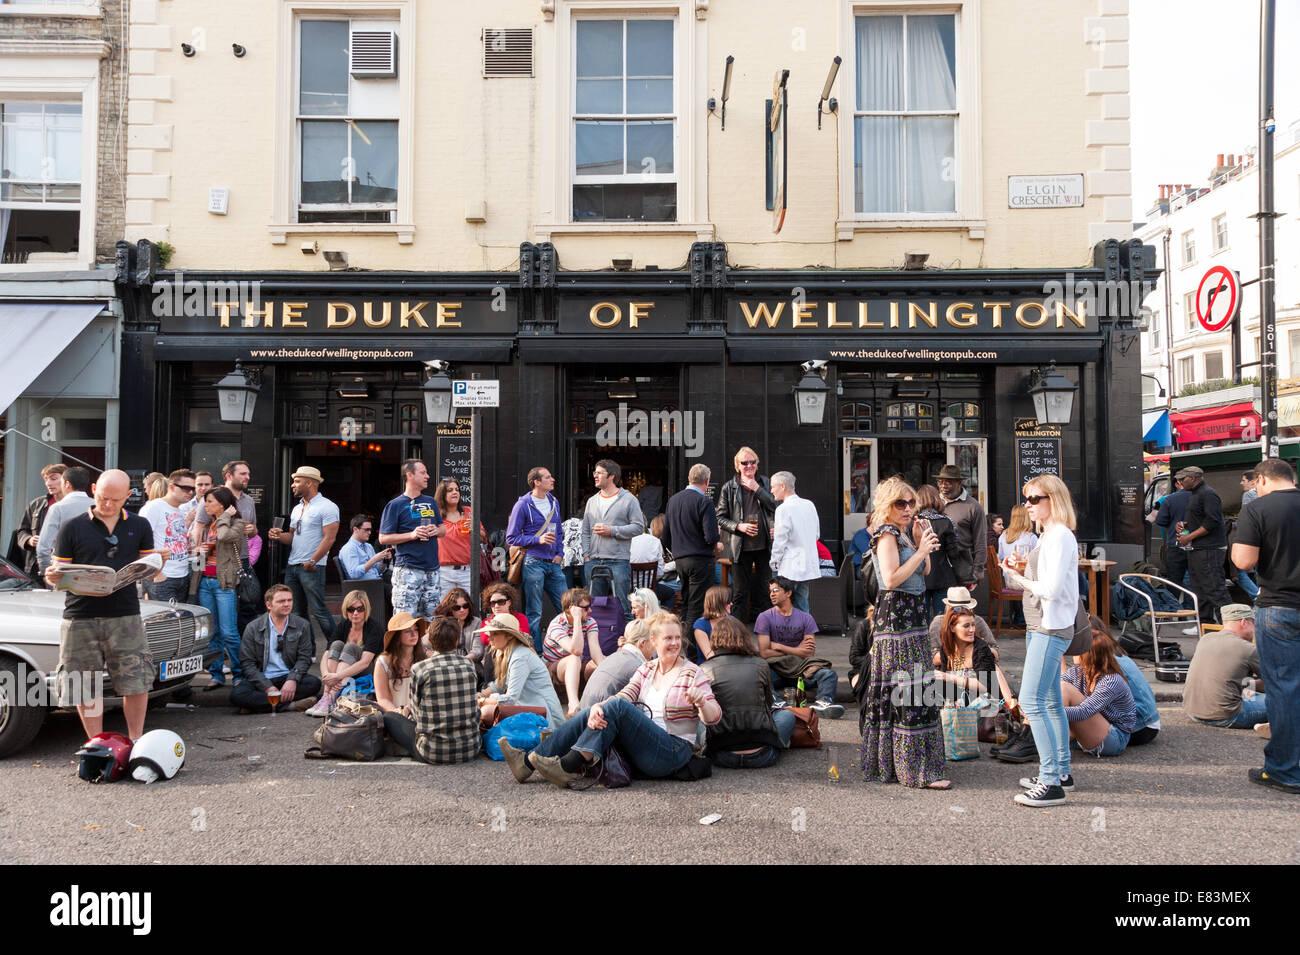 People drinking outside the Duke of Wellington pub on Portobello Road, Notting Hill, London, England, UK - Stock Image